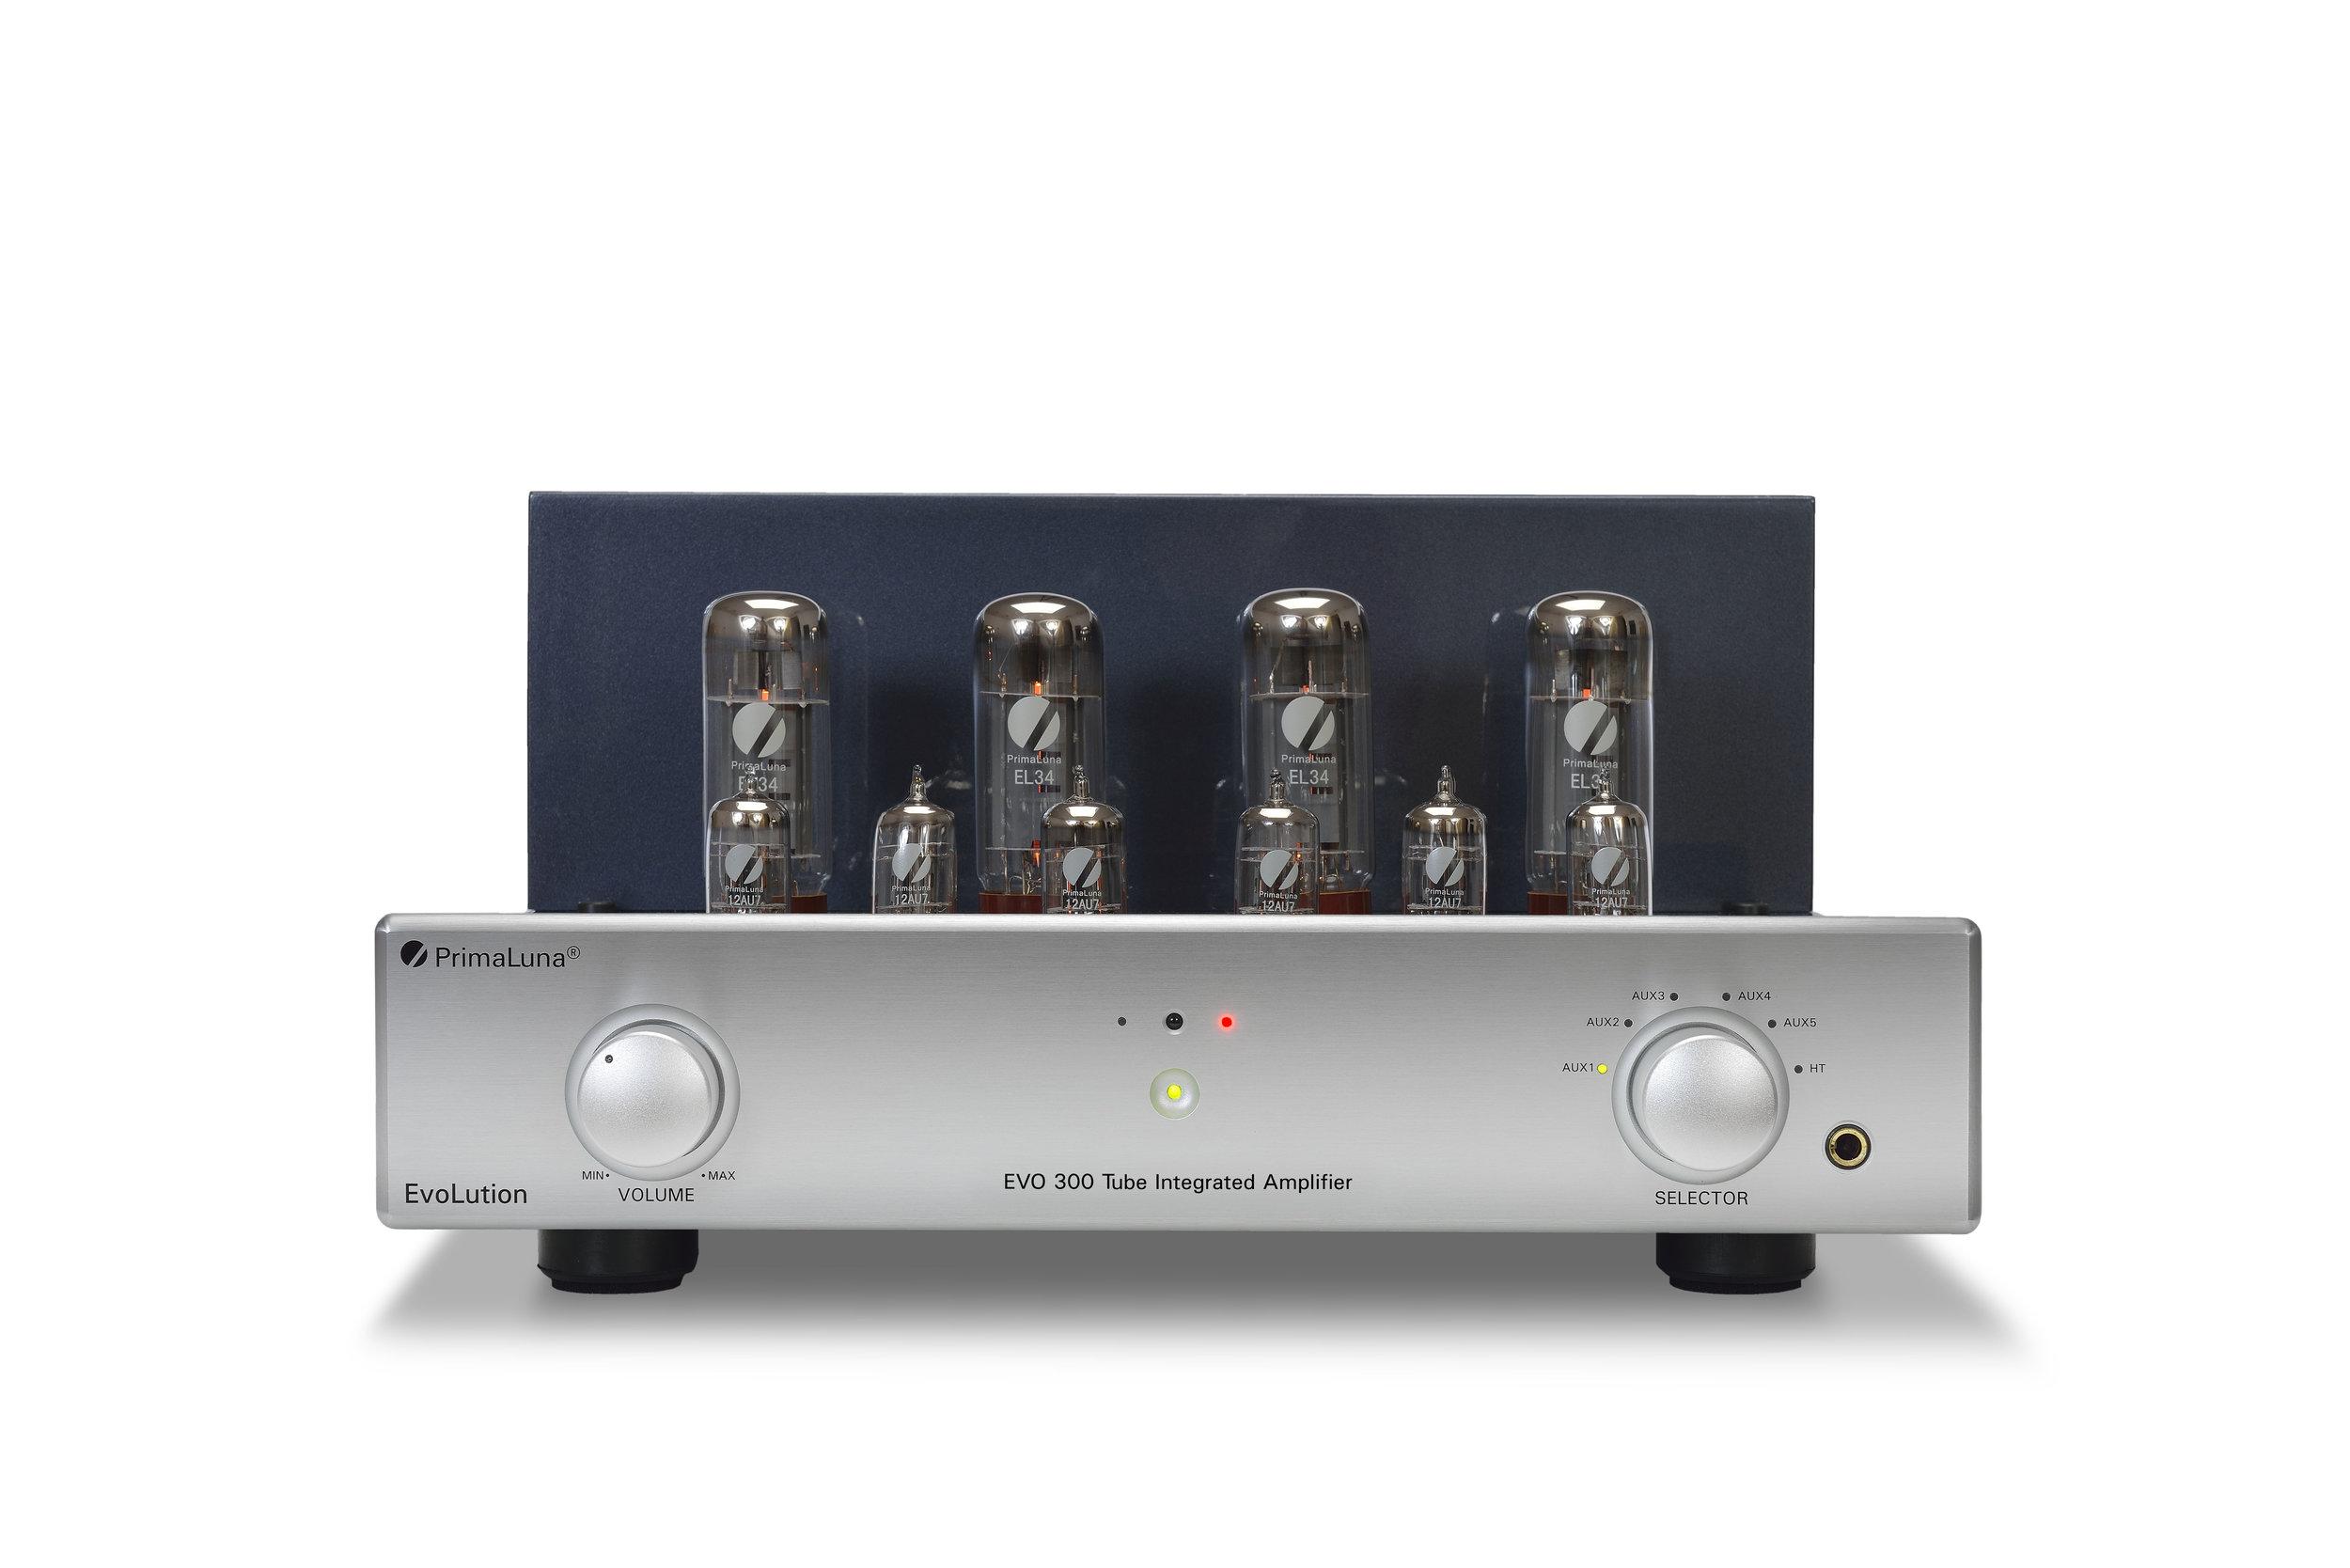 050b - PrimaLuna Evo 300 Tube Integrated Amplifier - silver - front low - white background - kopie.jpg